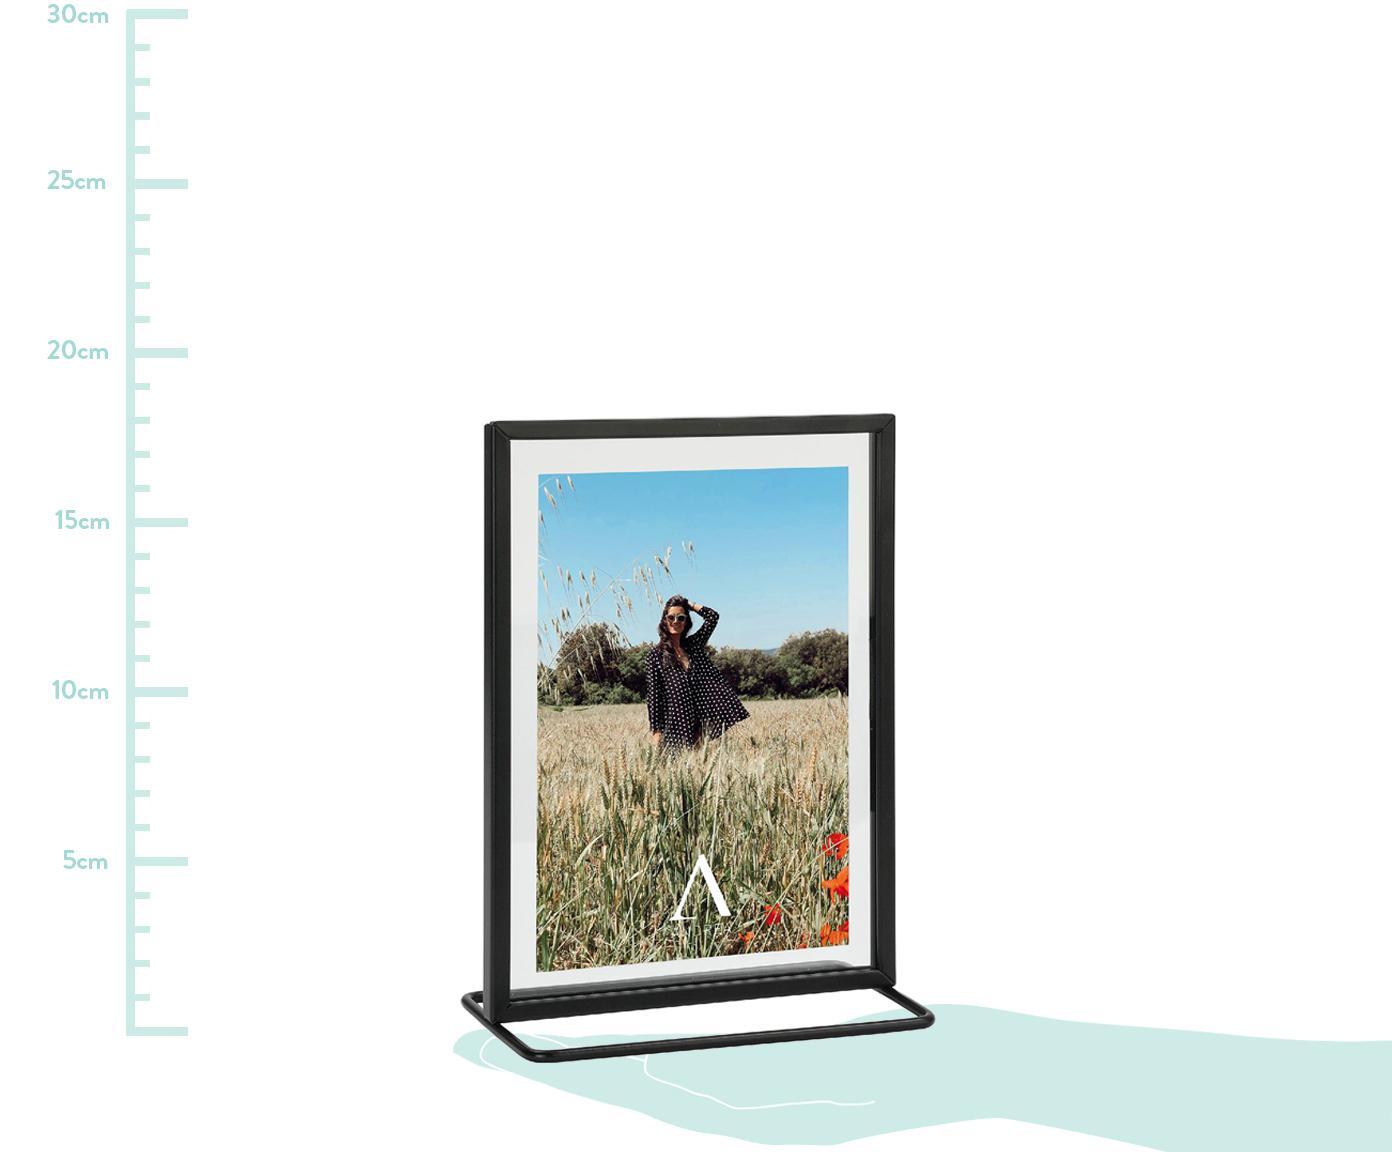 Ramka na zdjęcia Memo, Czarny, 13 x 18 cm